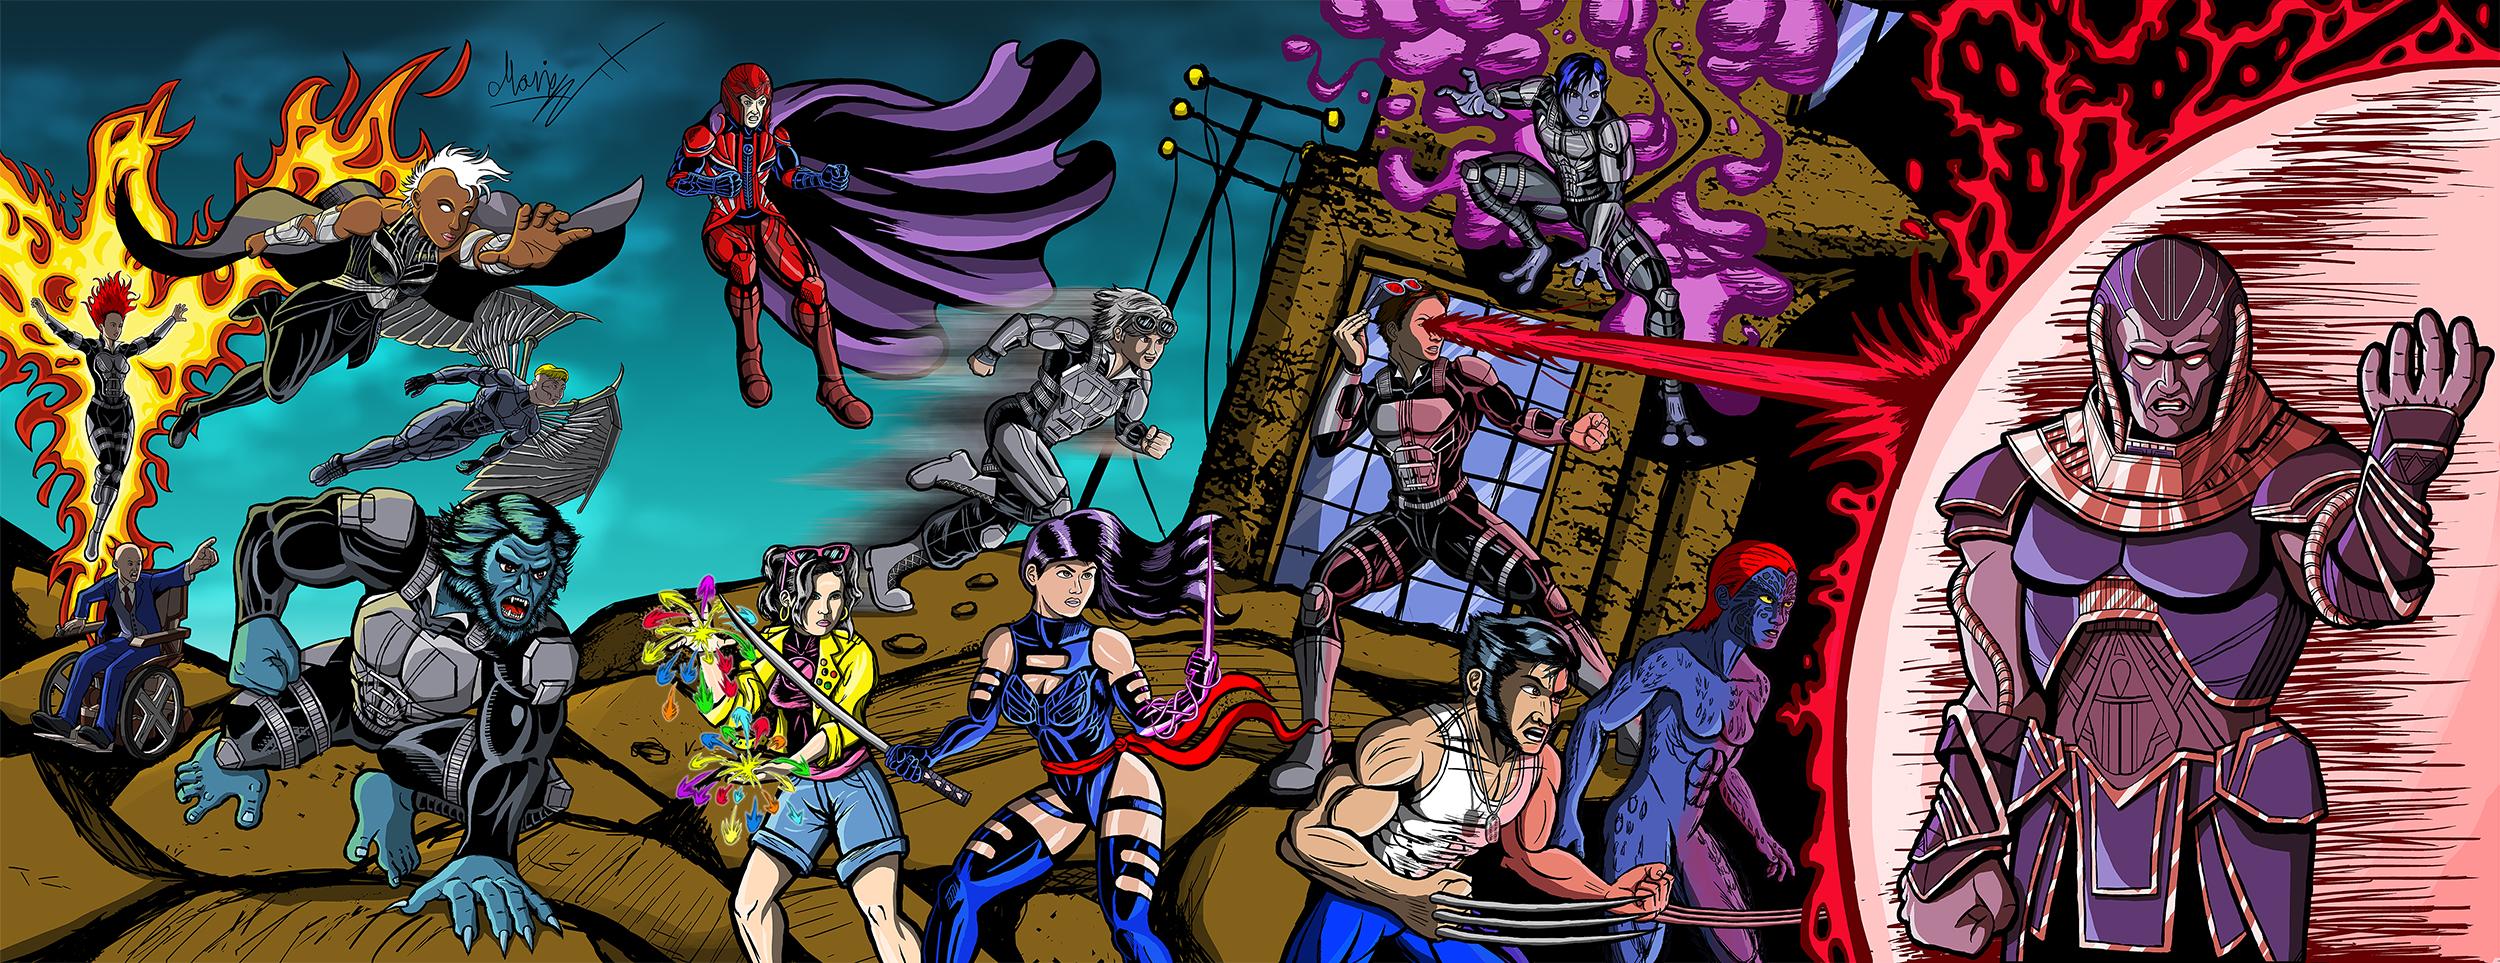 Color X-Men: Apocalypse Jim lee 90's cover Homage